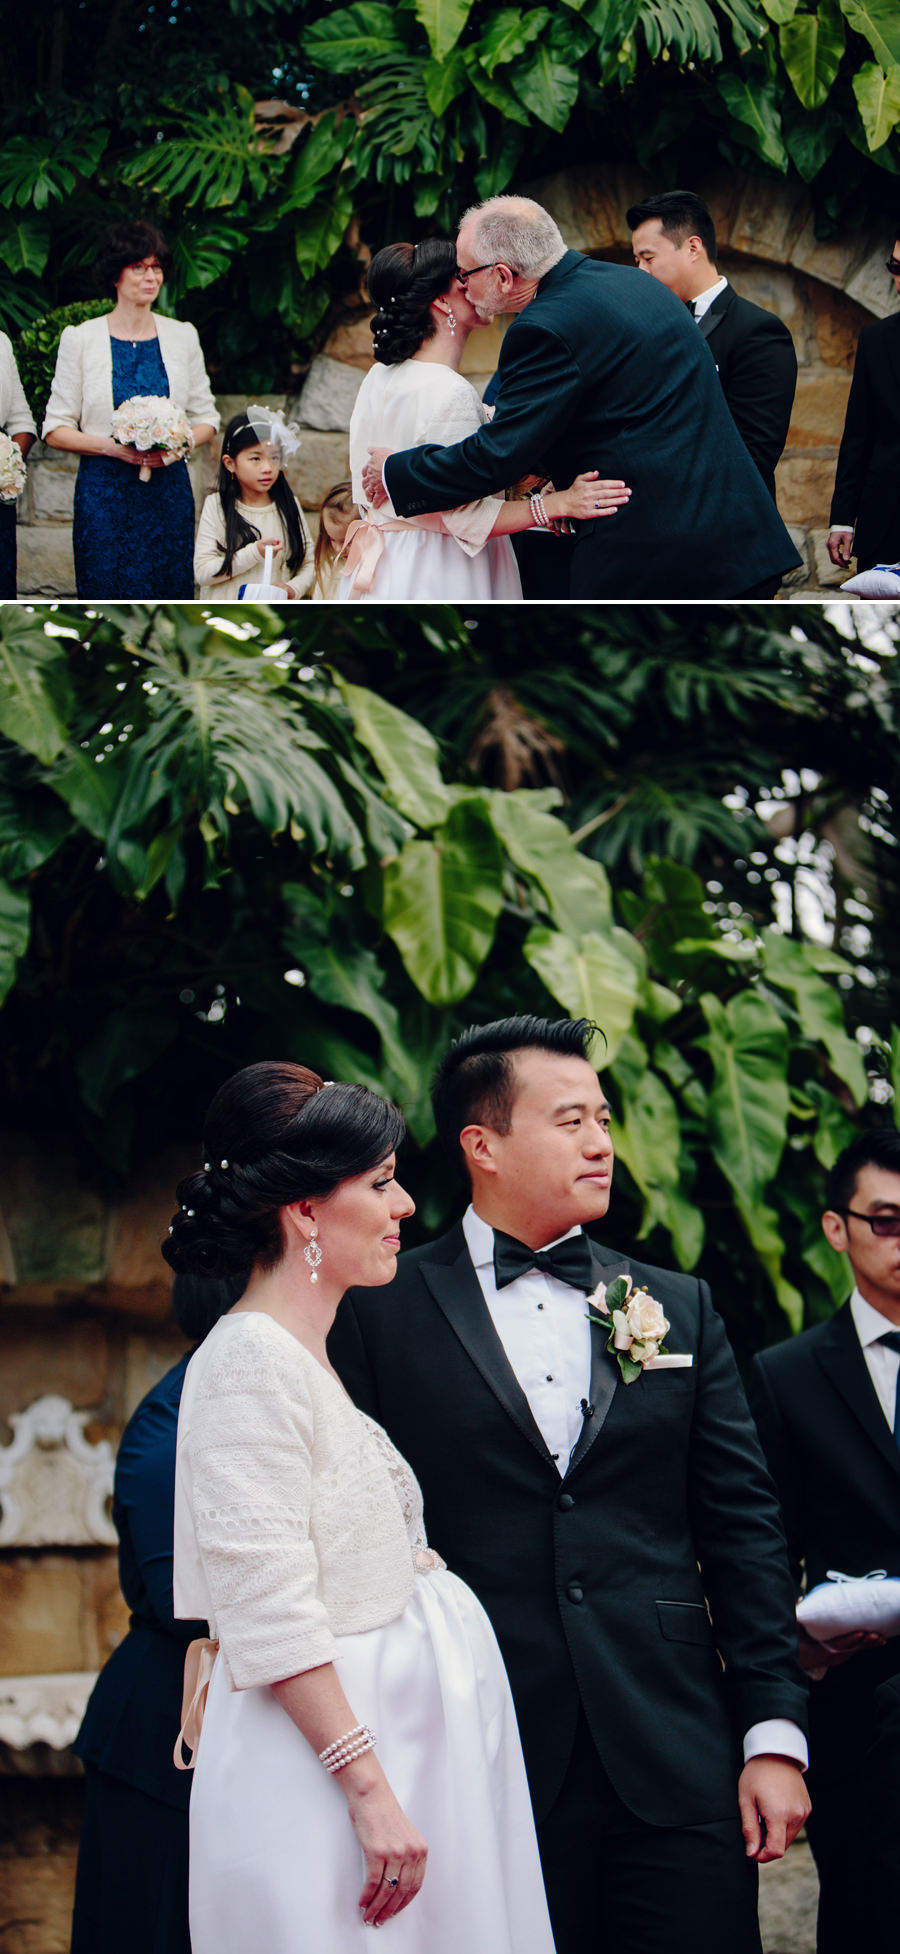 Enchanted Garden Wedding Photographers: Ceremony